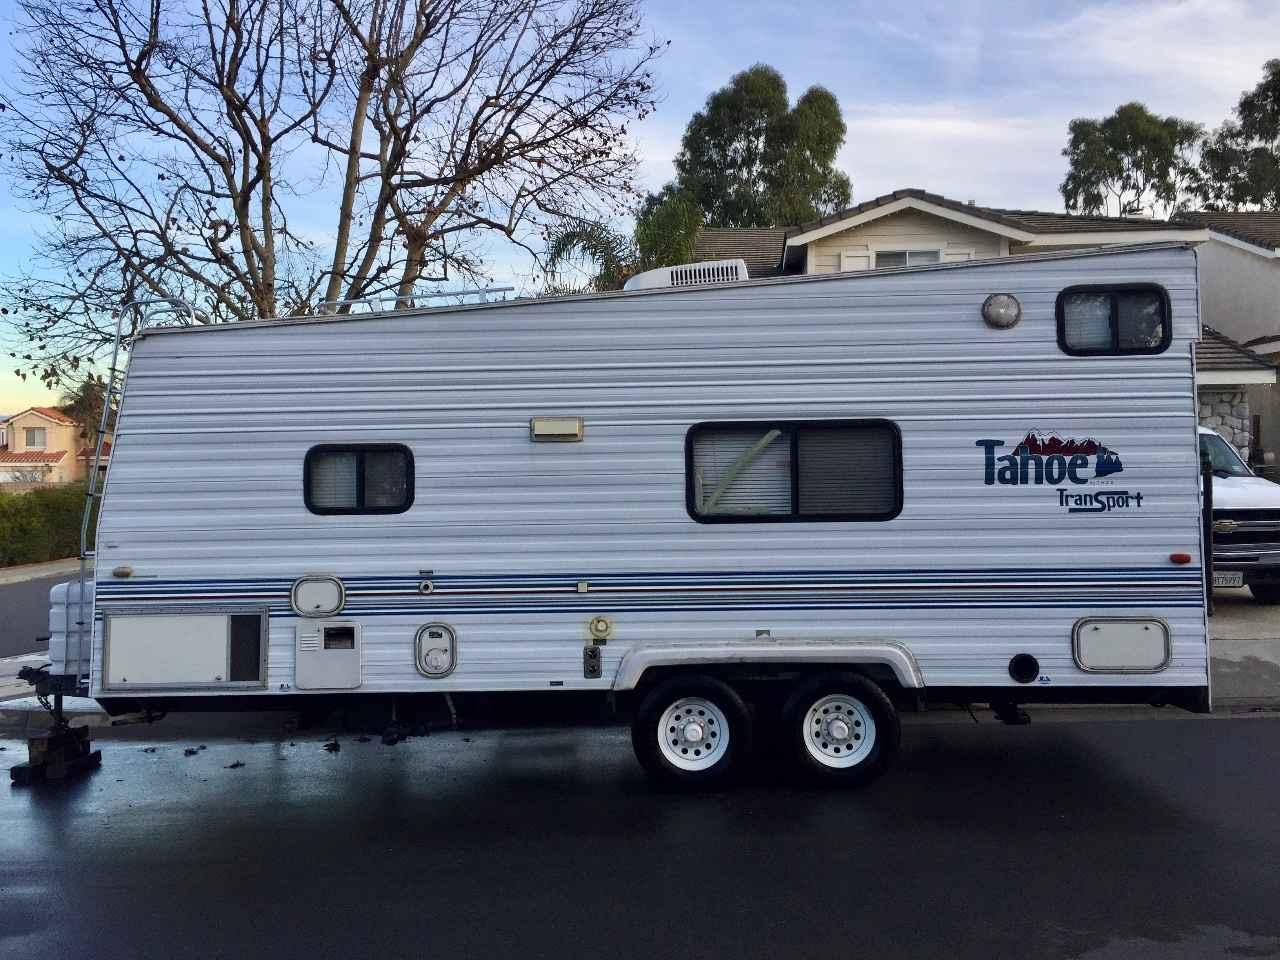 2000 Used Thor Motor Coach Tahoe 21tb Toy Hauler In